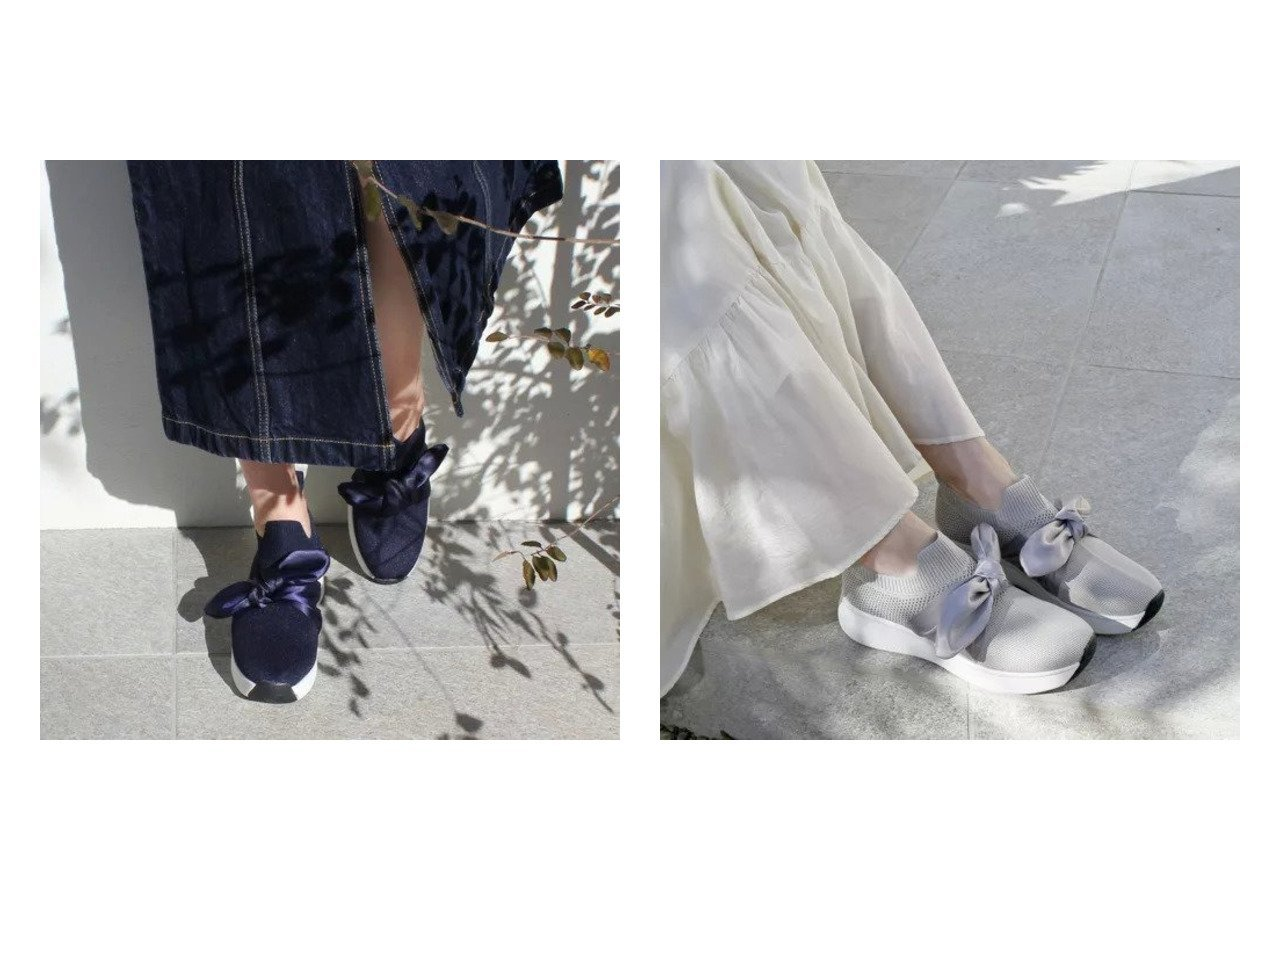 【enchanted/エンチャンテッド】の軽量メッシュサテンリボンスニーカー シューズ・靴のおすすめ!人気、トレンド・レディースファッションの通販 おすすめで人気の流行・トレンド、ファッションの通販商品 メンズファッション・キッズファッション・インテリア・家具・レディースファッション・服の通販 founy(ファニー) https://founy.com/ ファッション Fashion レディースファッション WOMEN サテン シューズ スニーカー バランス メッシュ リボン 軽量 |ID:crp329100000022565